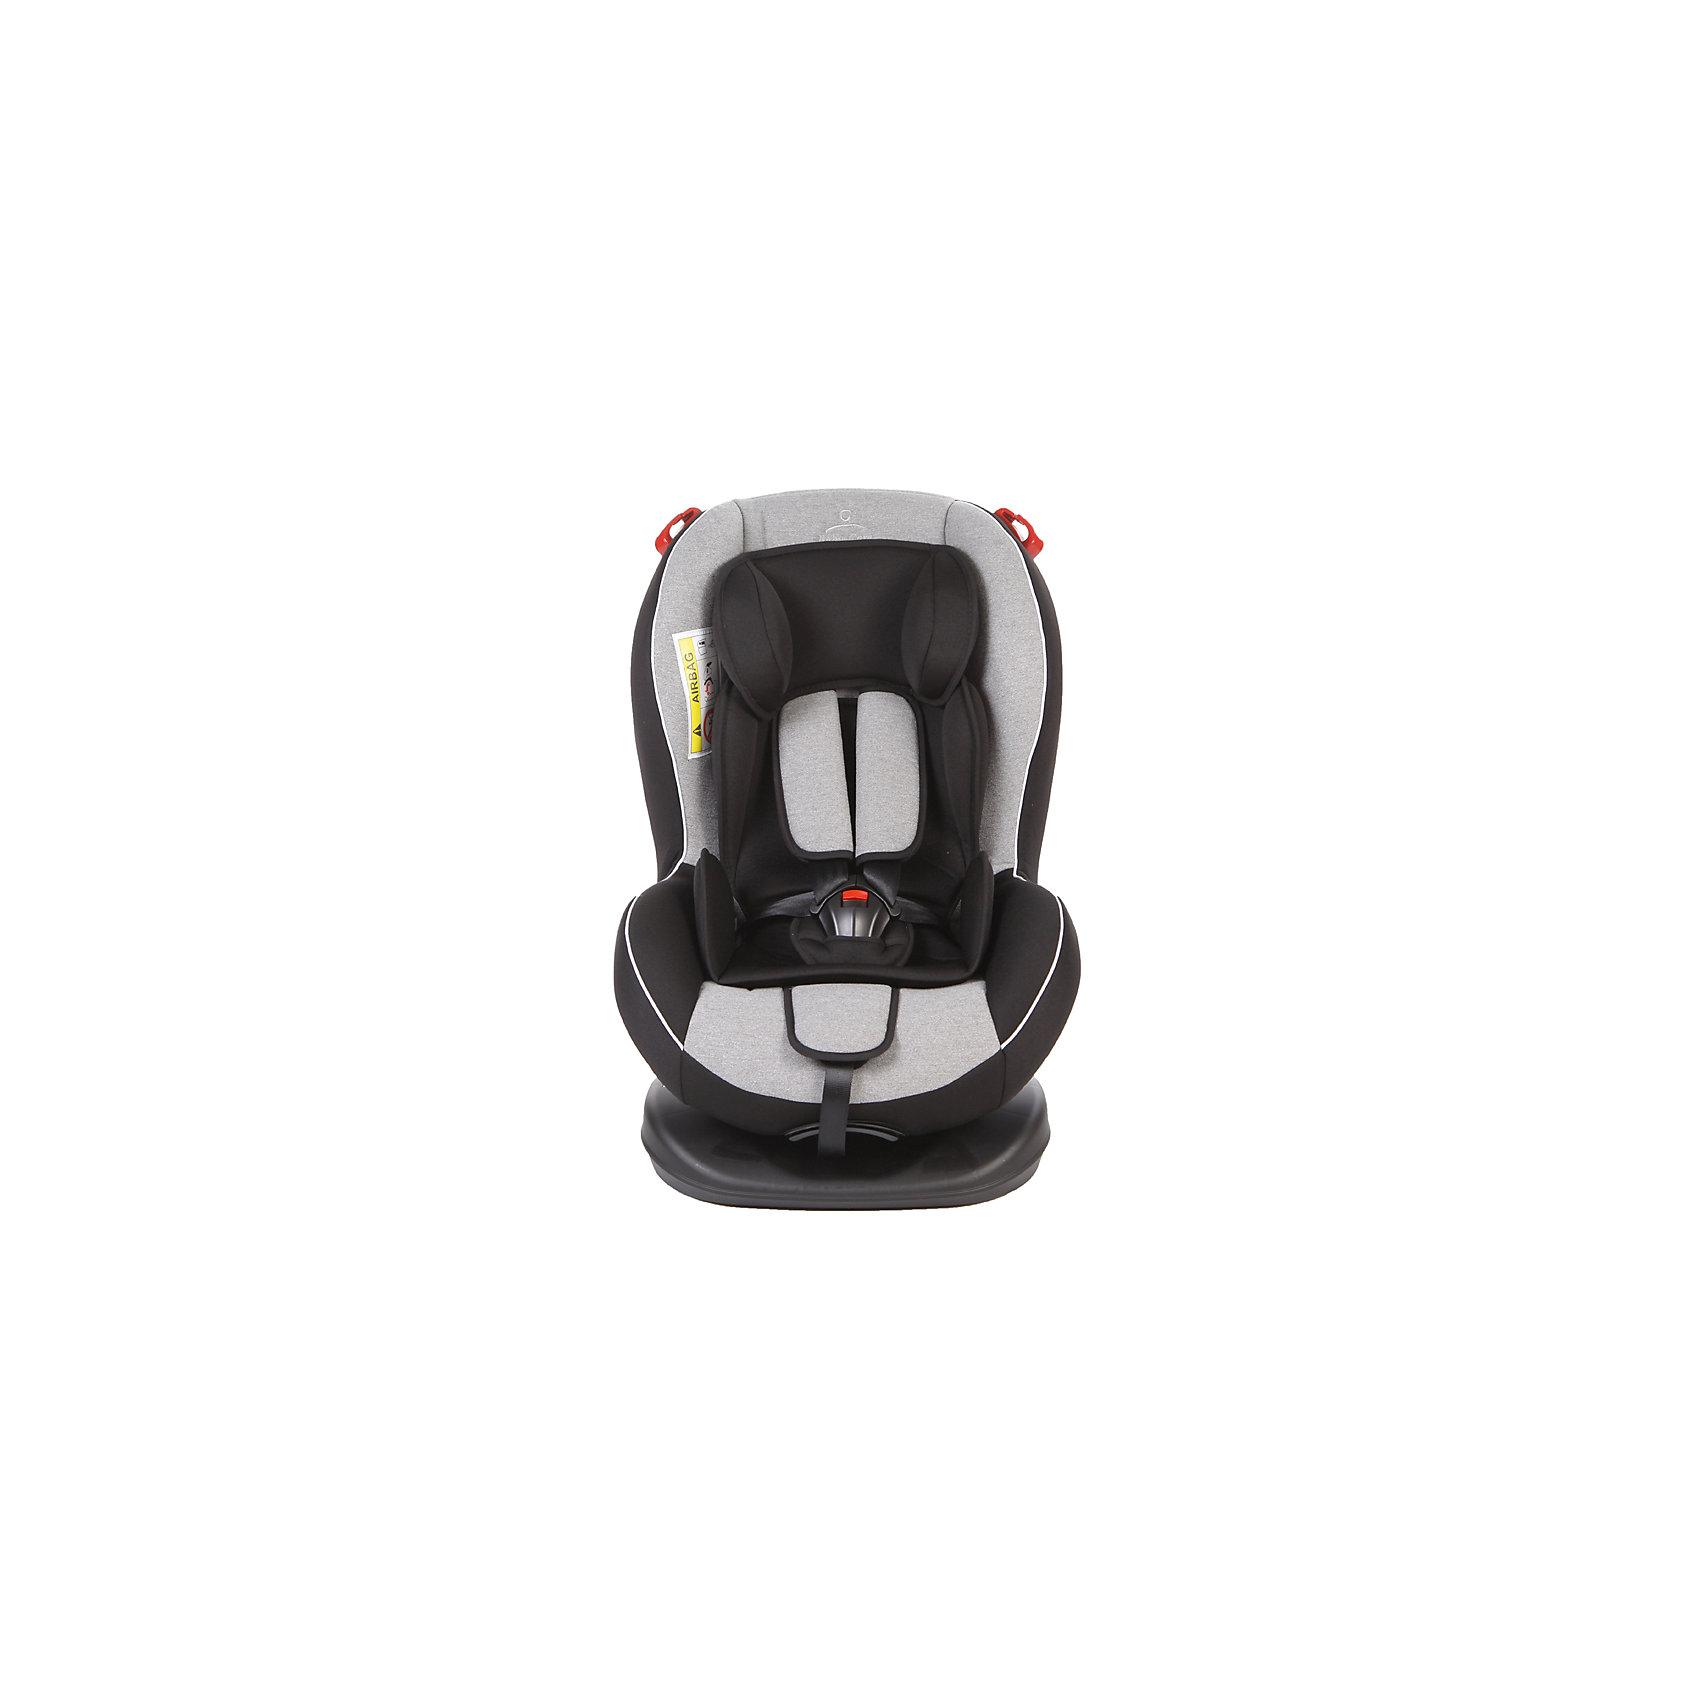 Фото Baby Care Автокресло Basic Evolution 0-25 кг, Baby Care, серый/чёрный